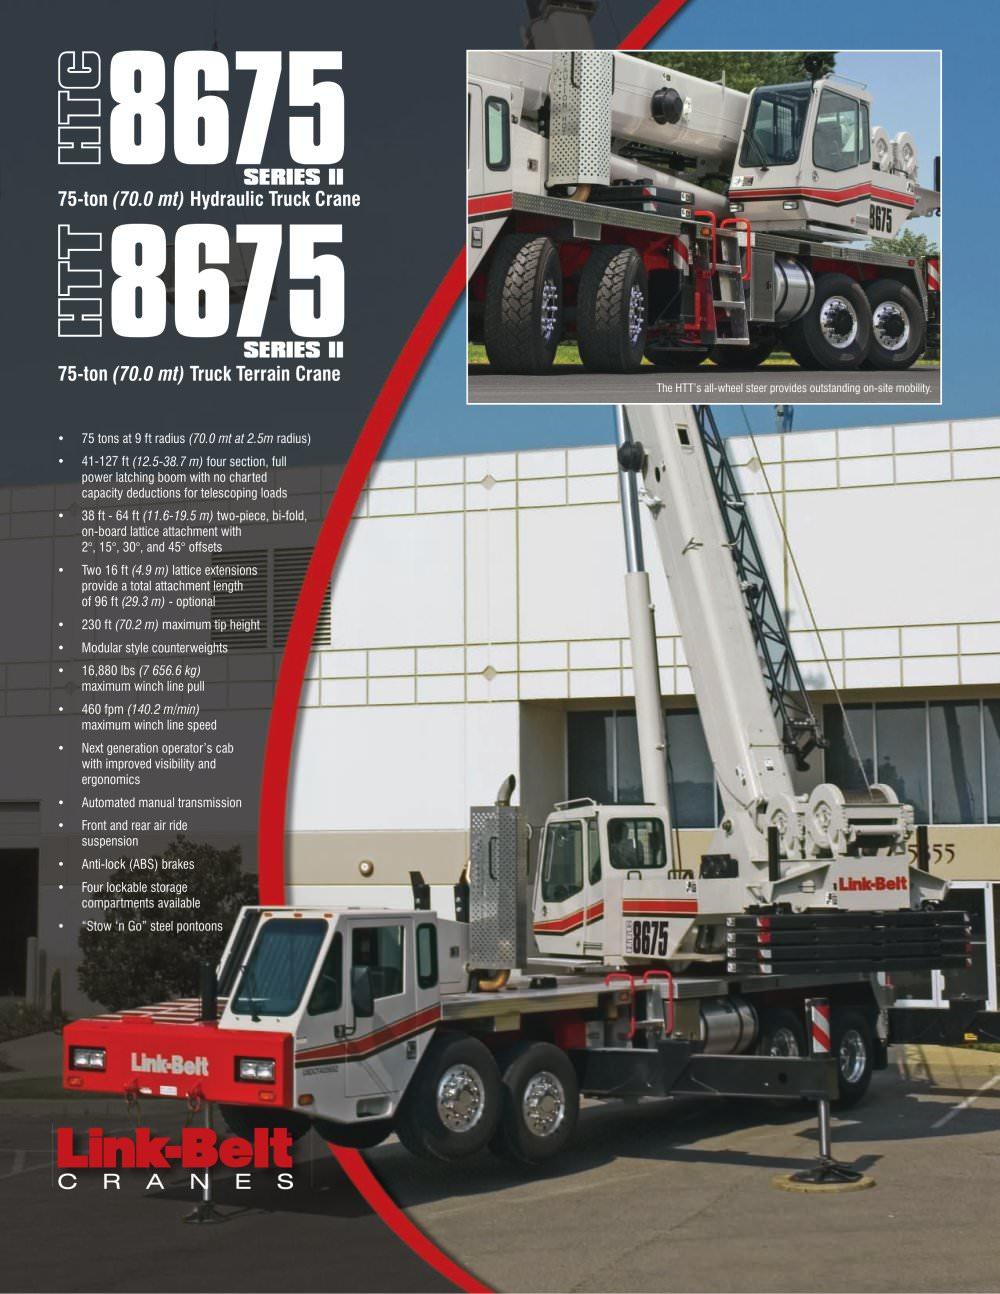 El juego de las imagenes-http://img.directindustry.com/pdf/repository_di/16716/link-belt-htc-8675-ii-75-ton-700-mt-hydraulic-truck-crane-104057_1b.jpg